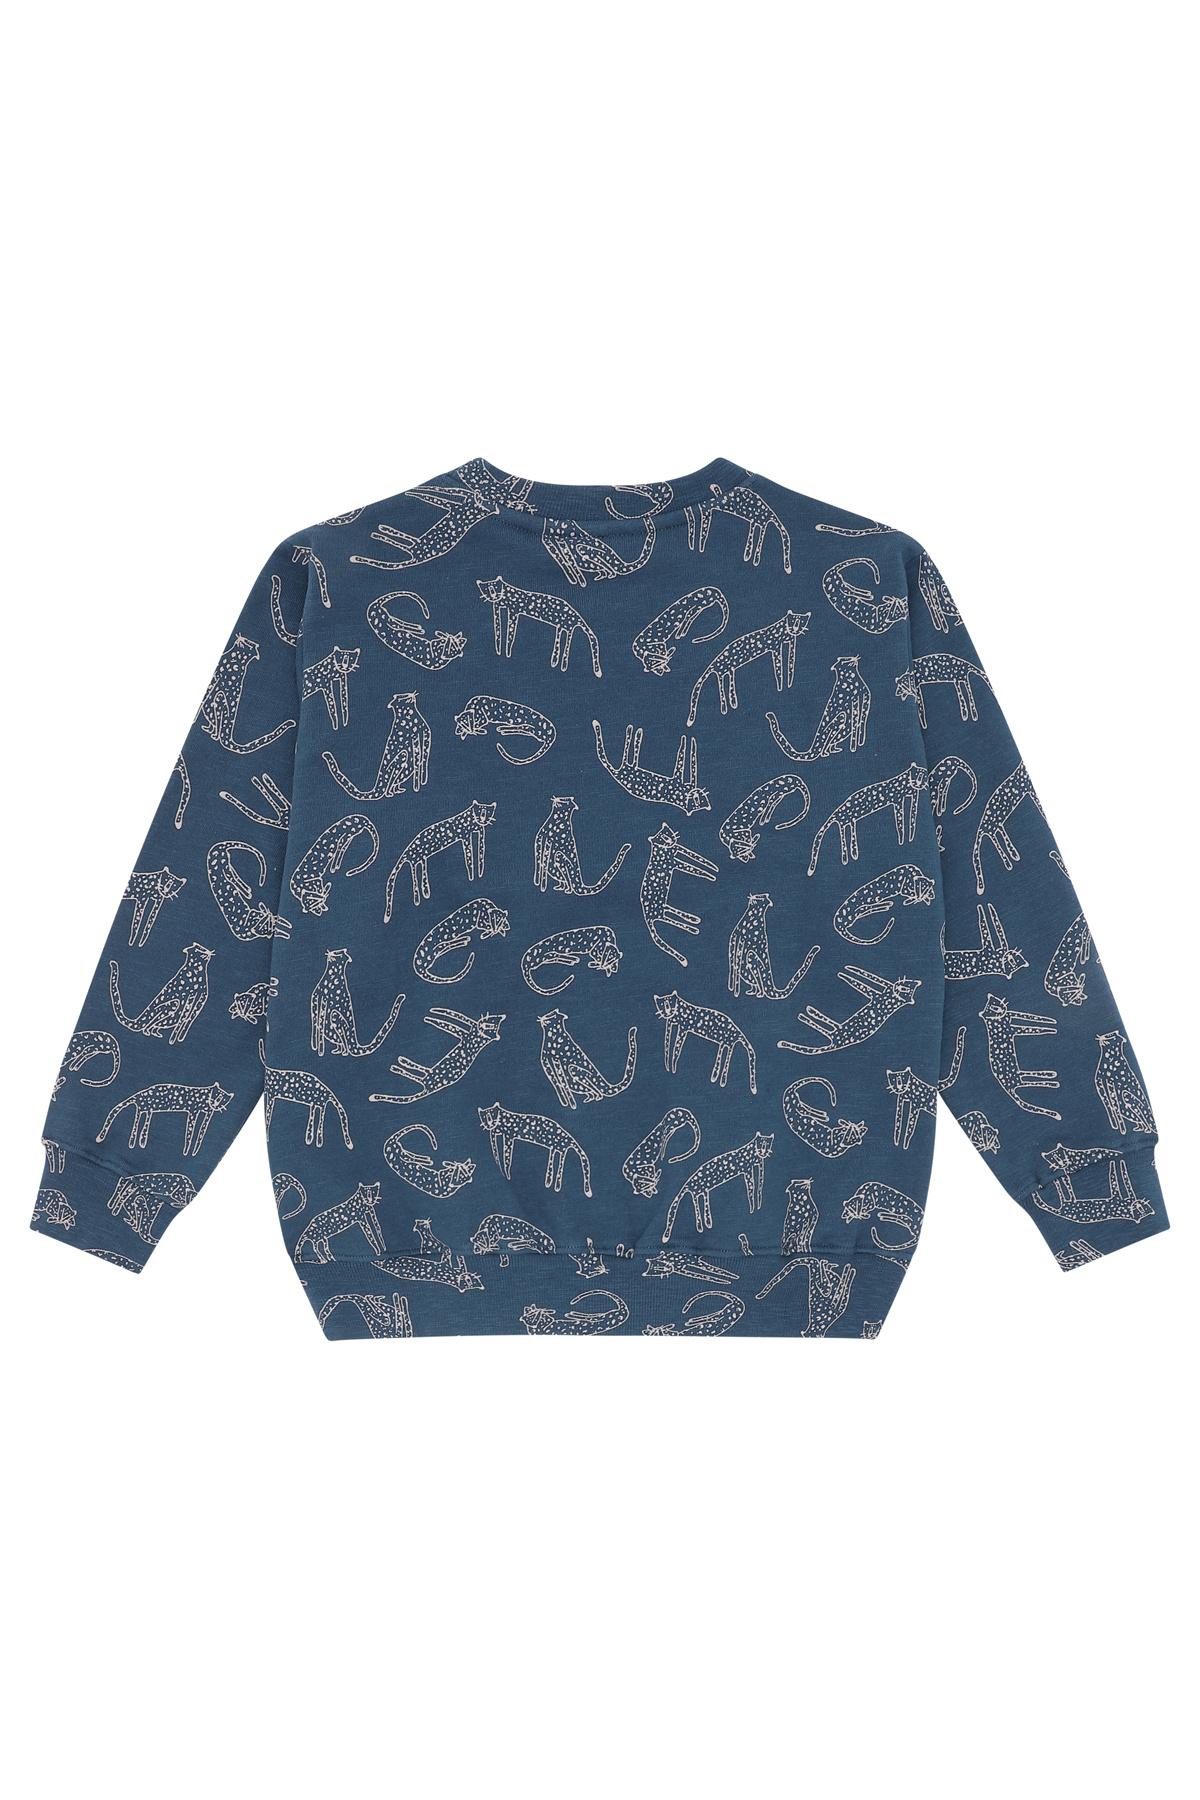 Baptiste sweatshirt - Majolica Blue-2